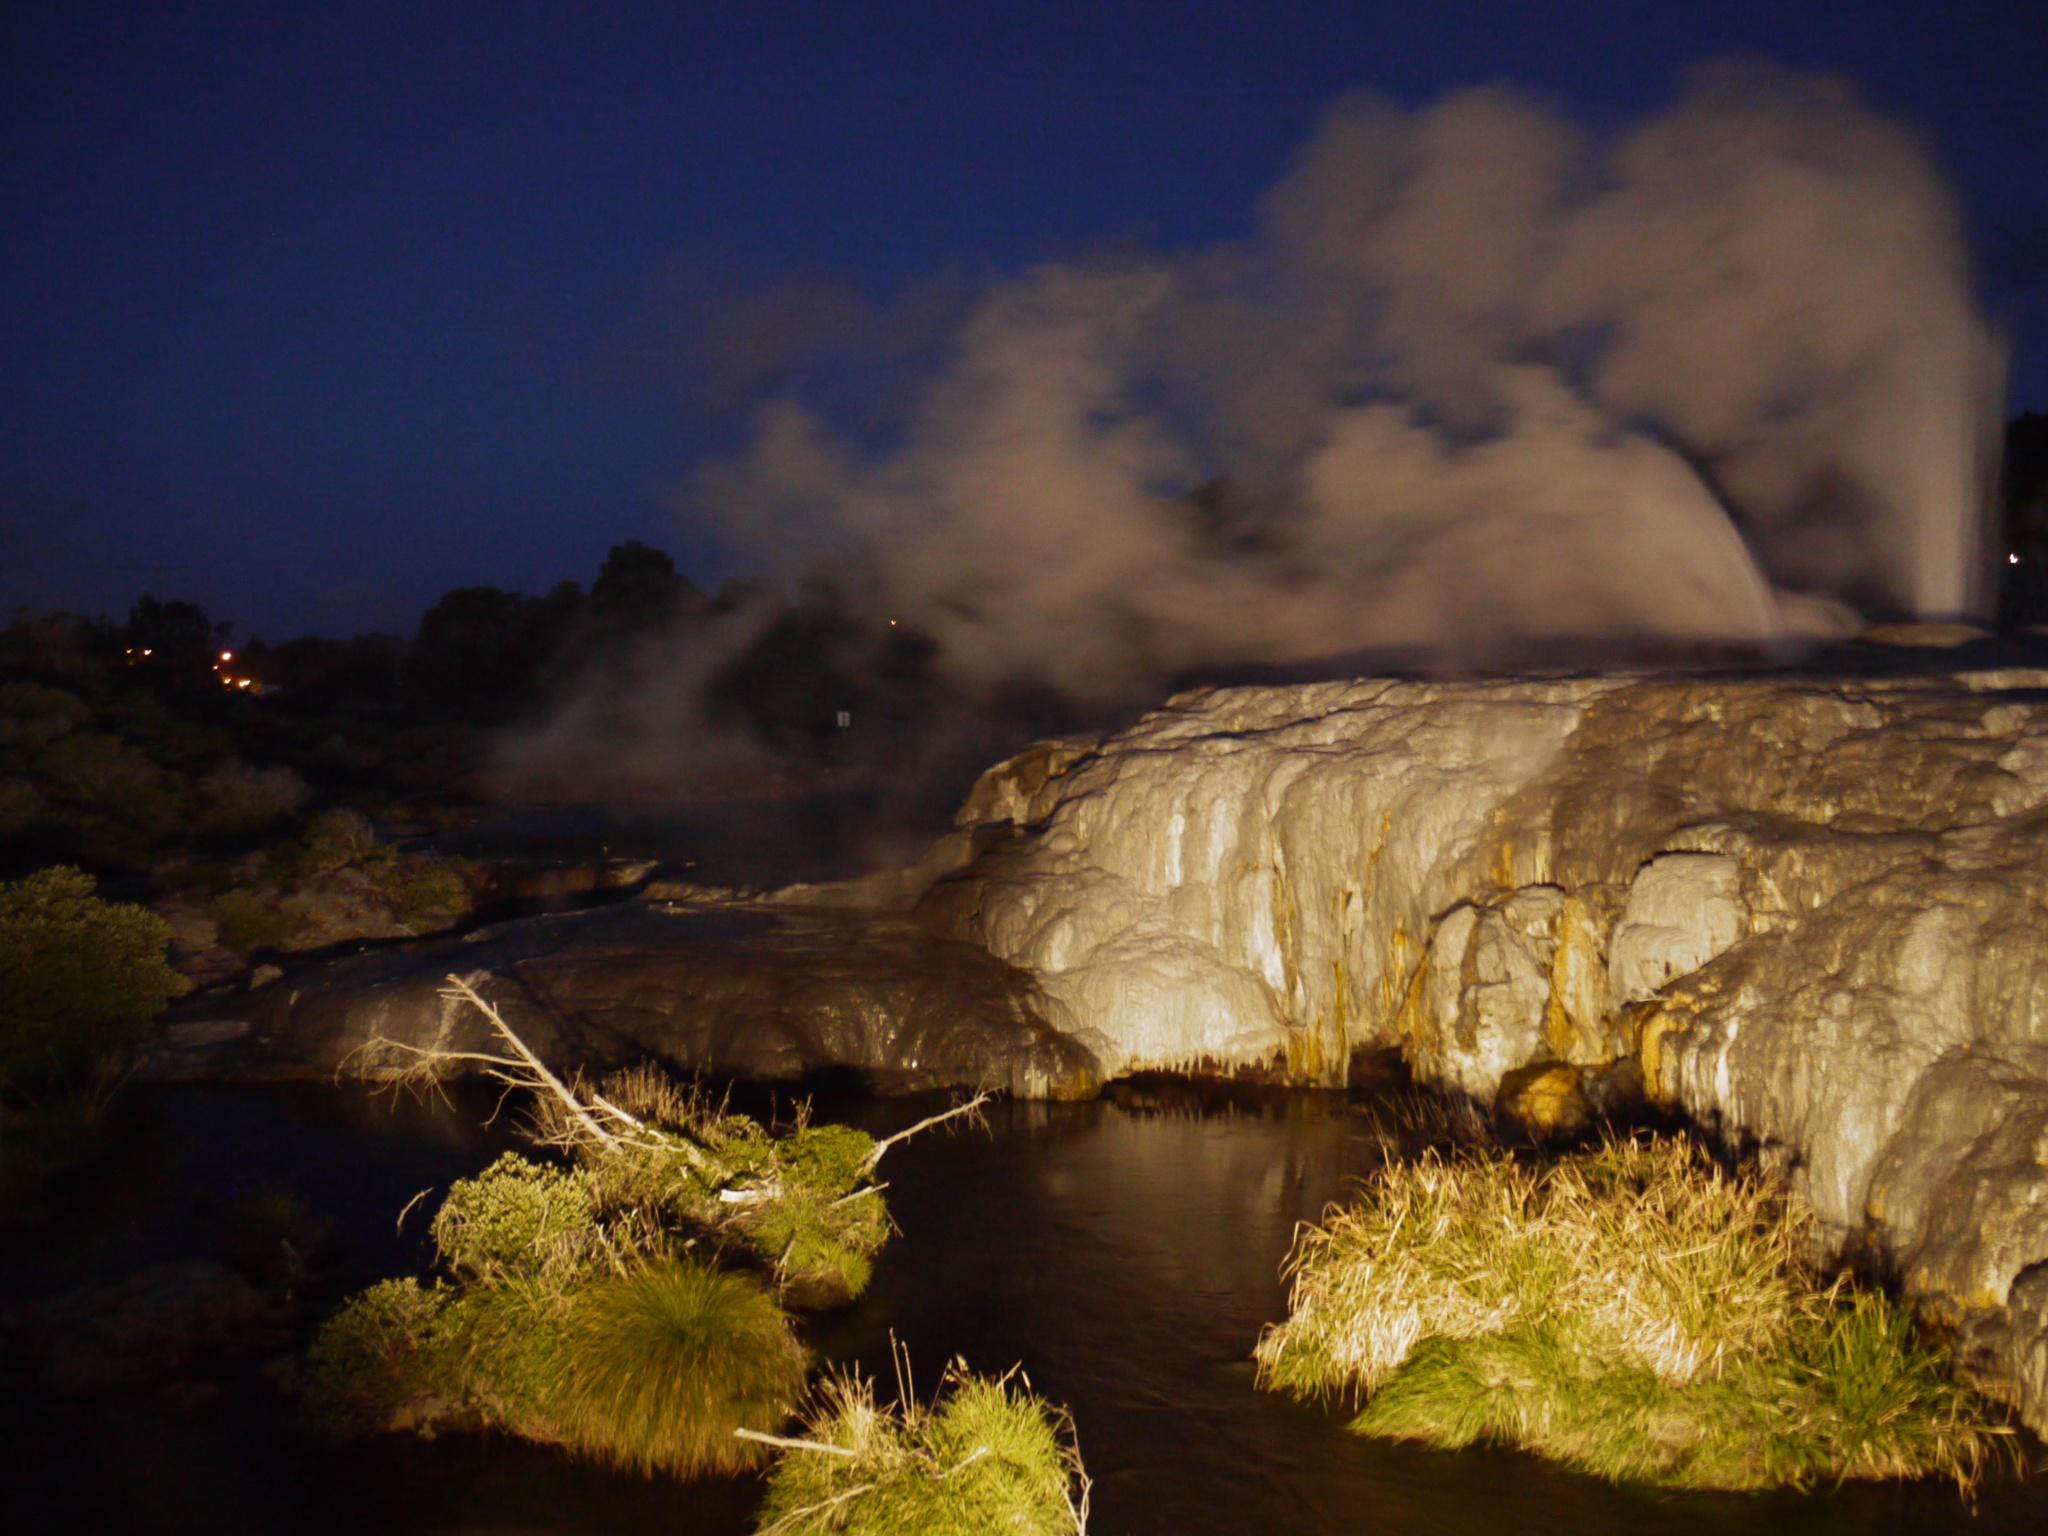 Rotorua geyser at night by Stuart51